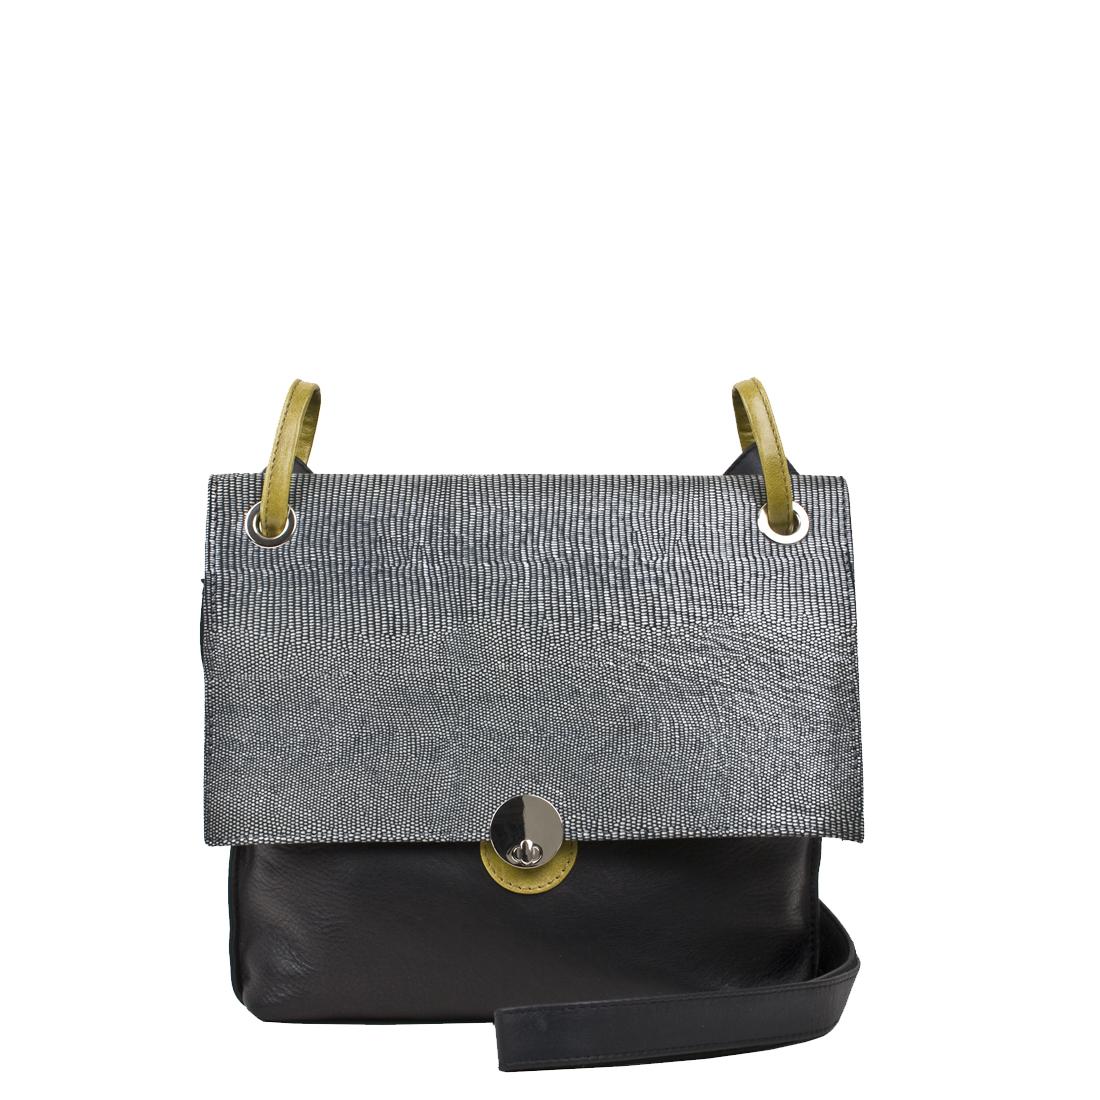 Medium Riley Black Leather Across Body Bag